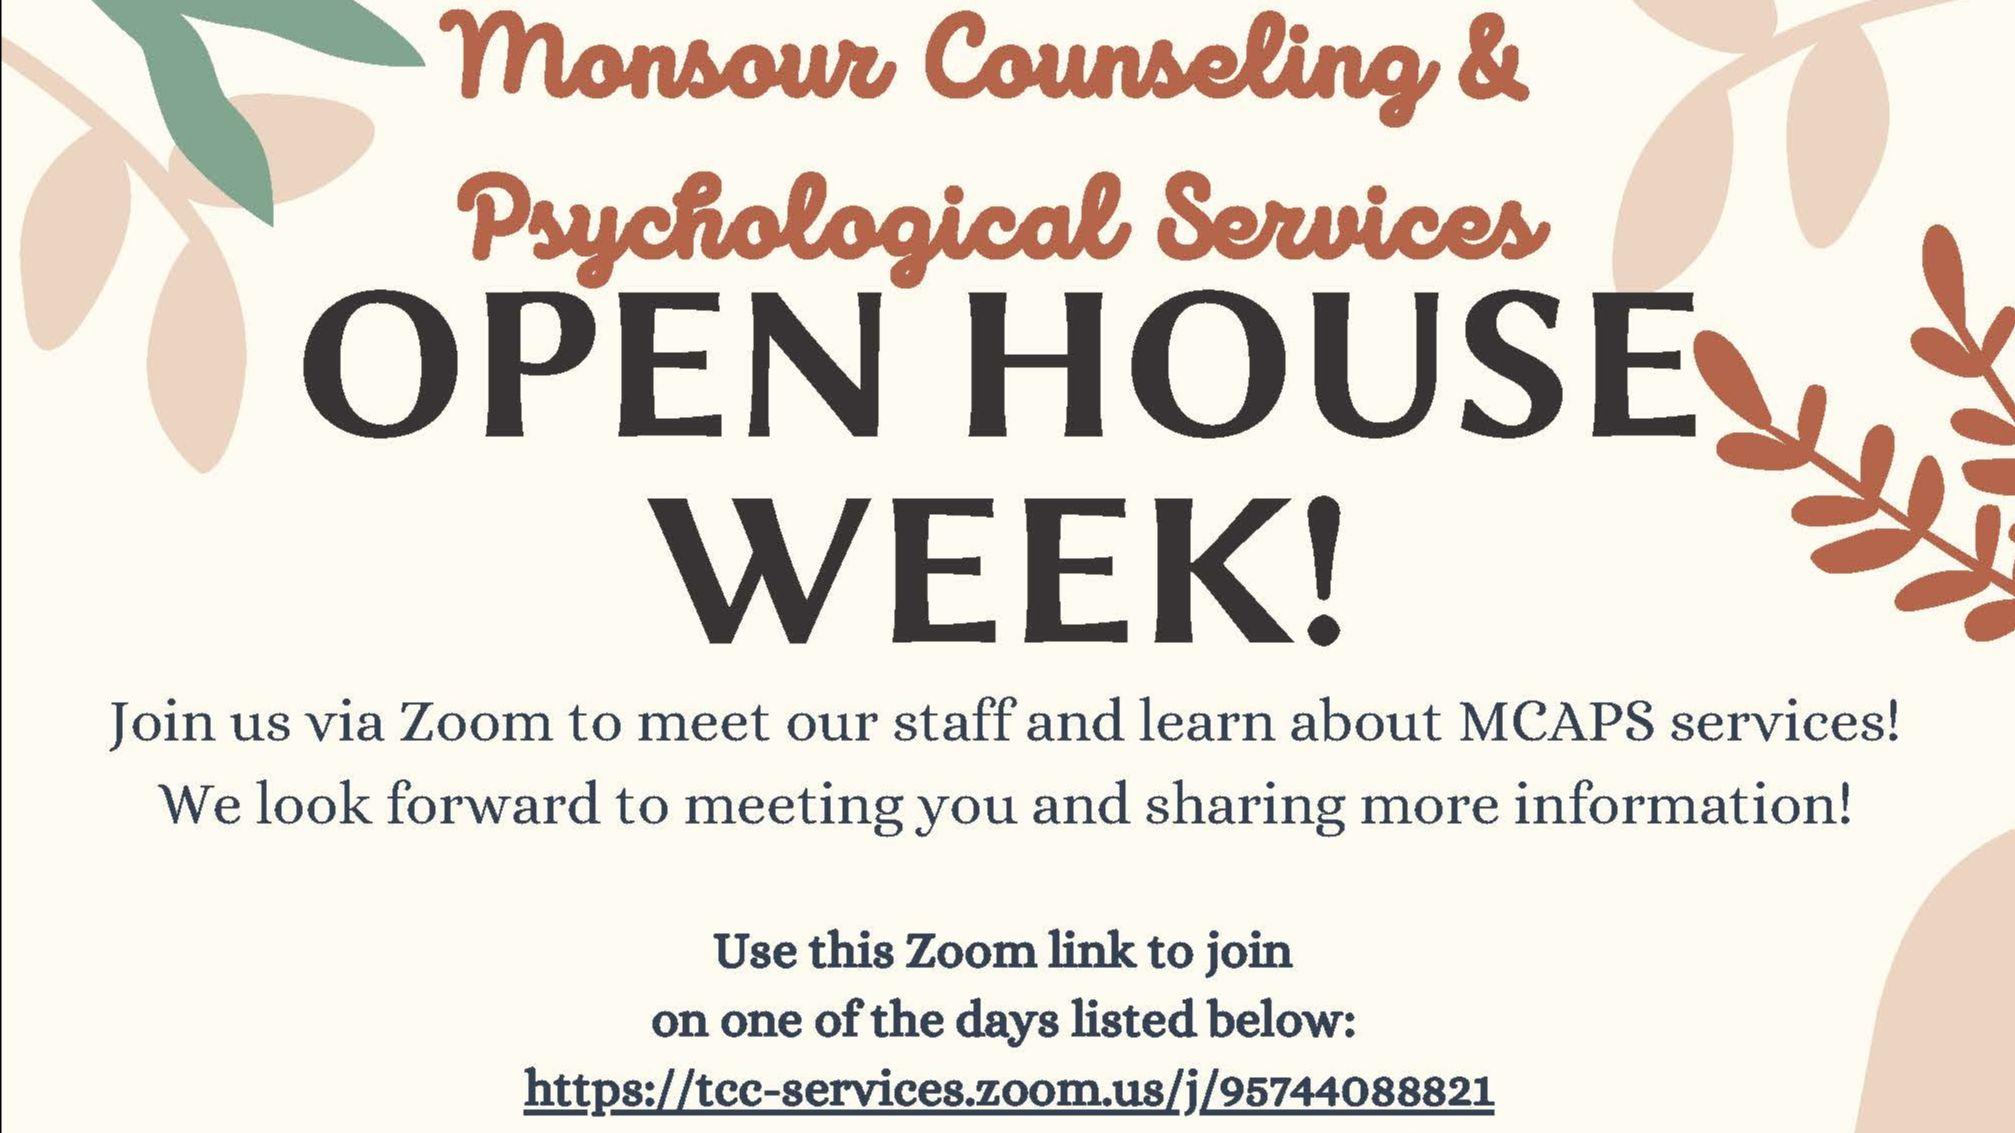 MCAPS Open House Week!